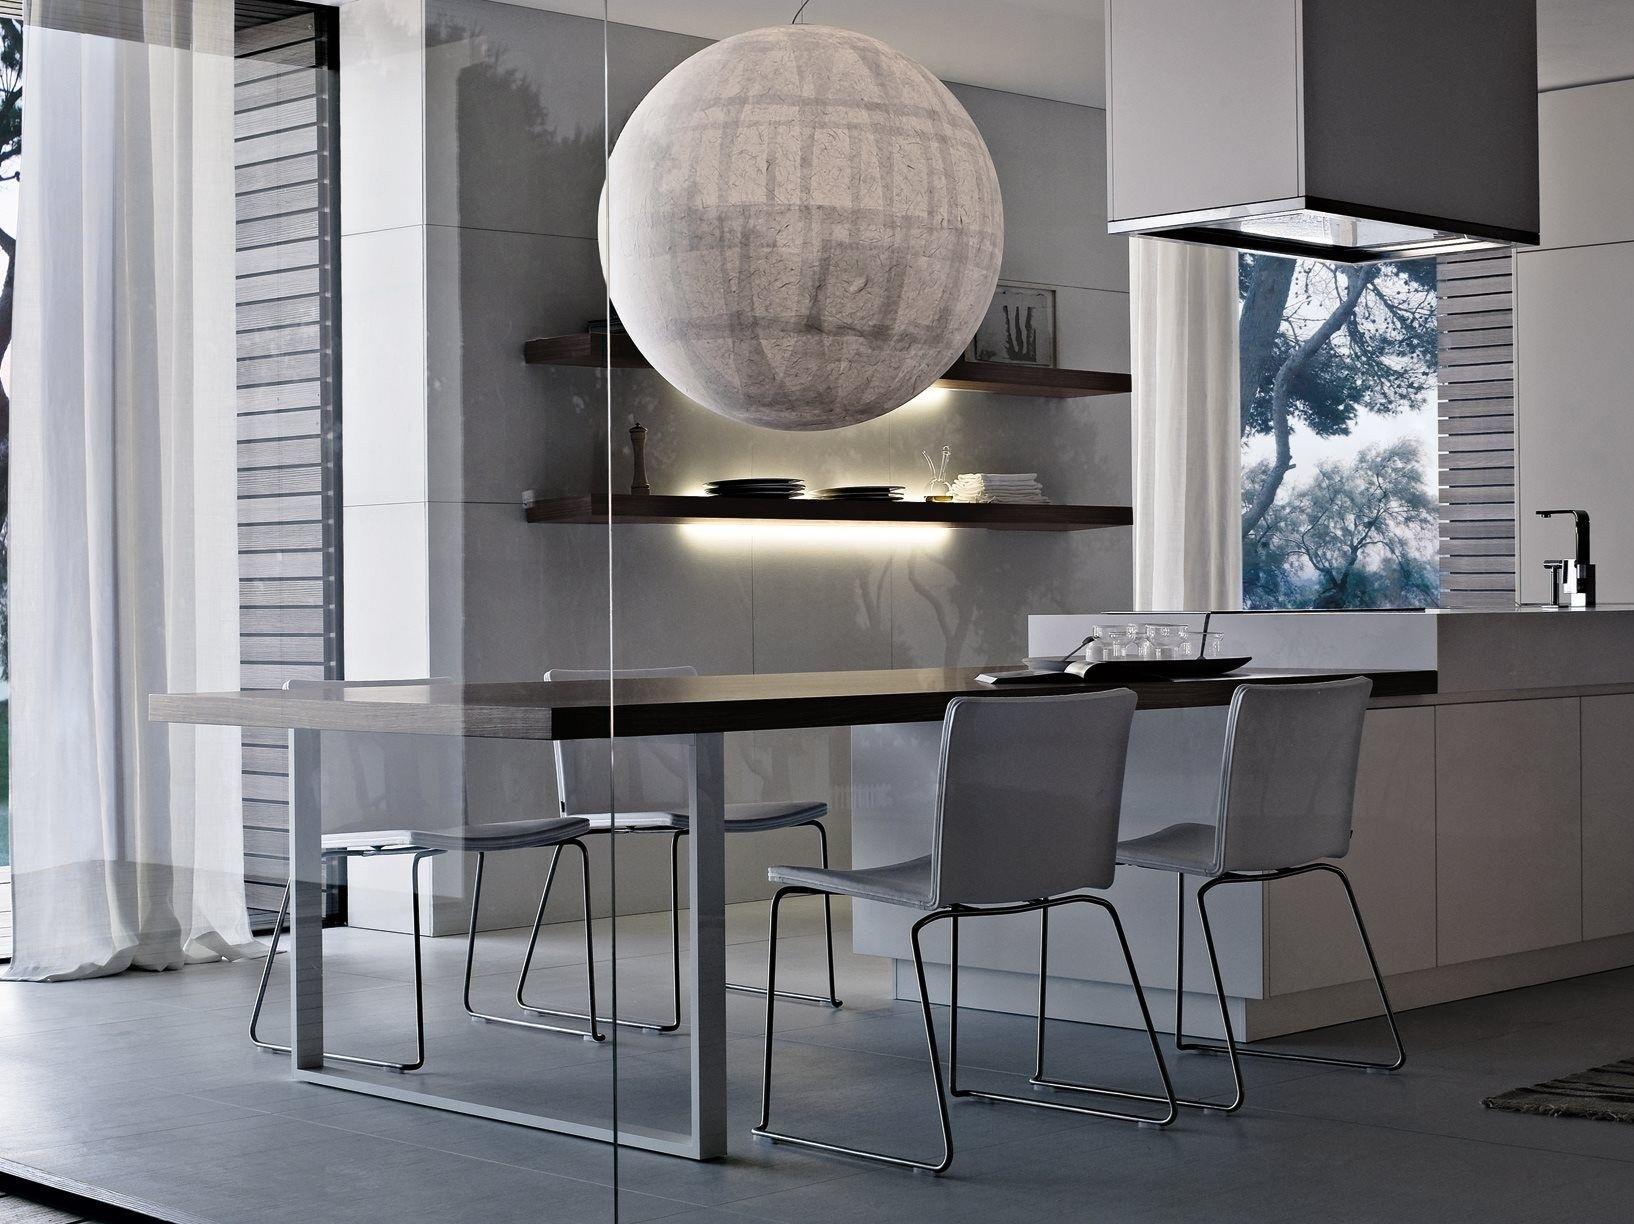 Home products chairs ics ipsilon - Home Products Chairs Ics Ipsilon 8